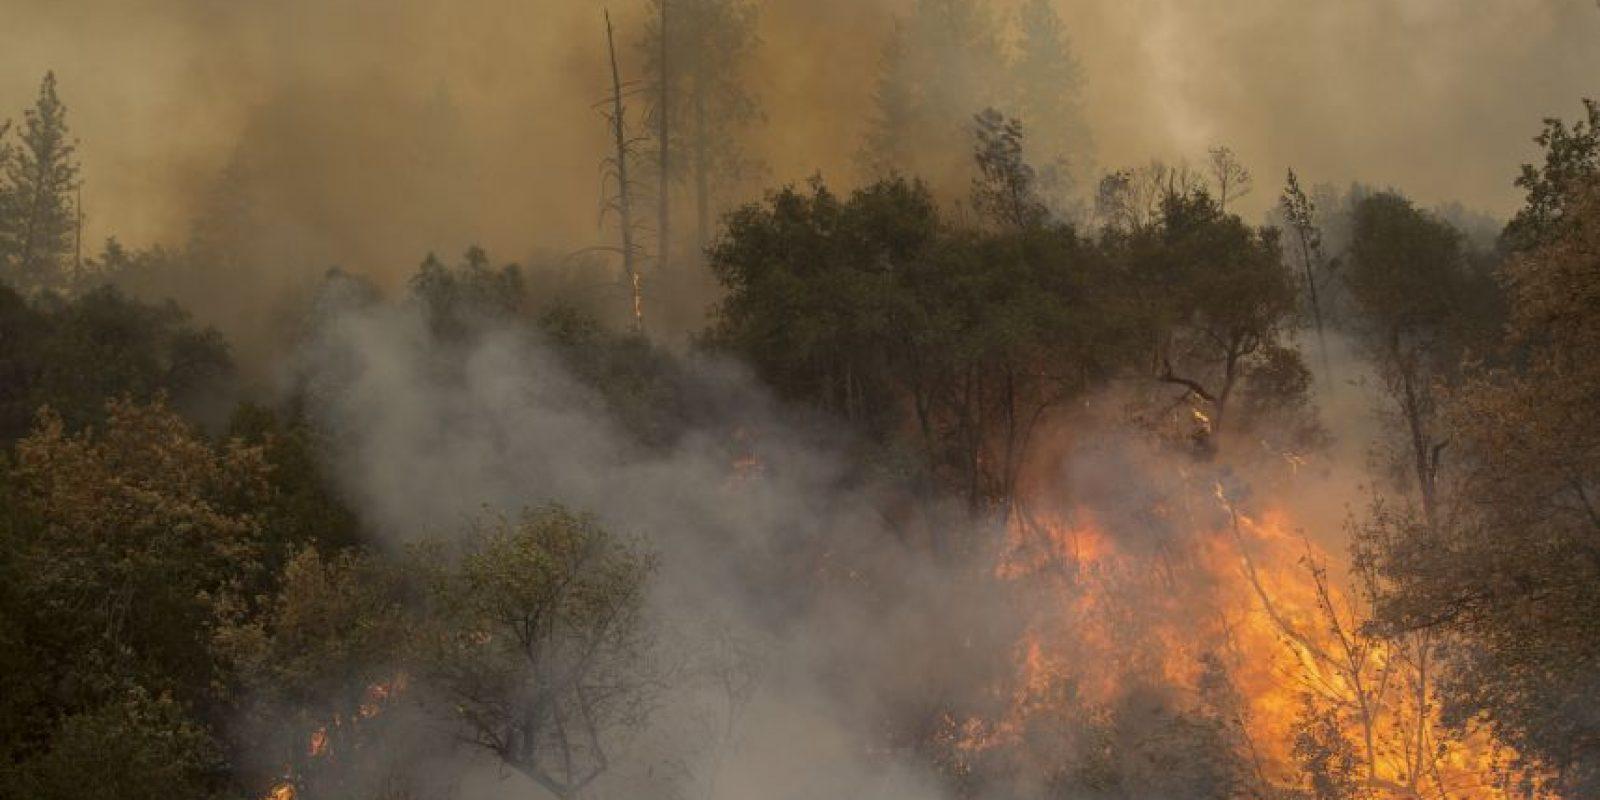 La Guardia civil detuvo al presunto culpable de 10 incendios. Foto:Getty Images